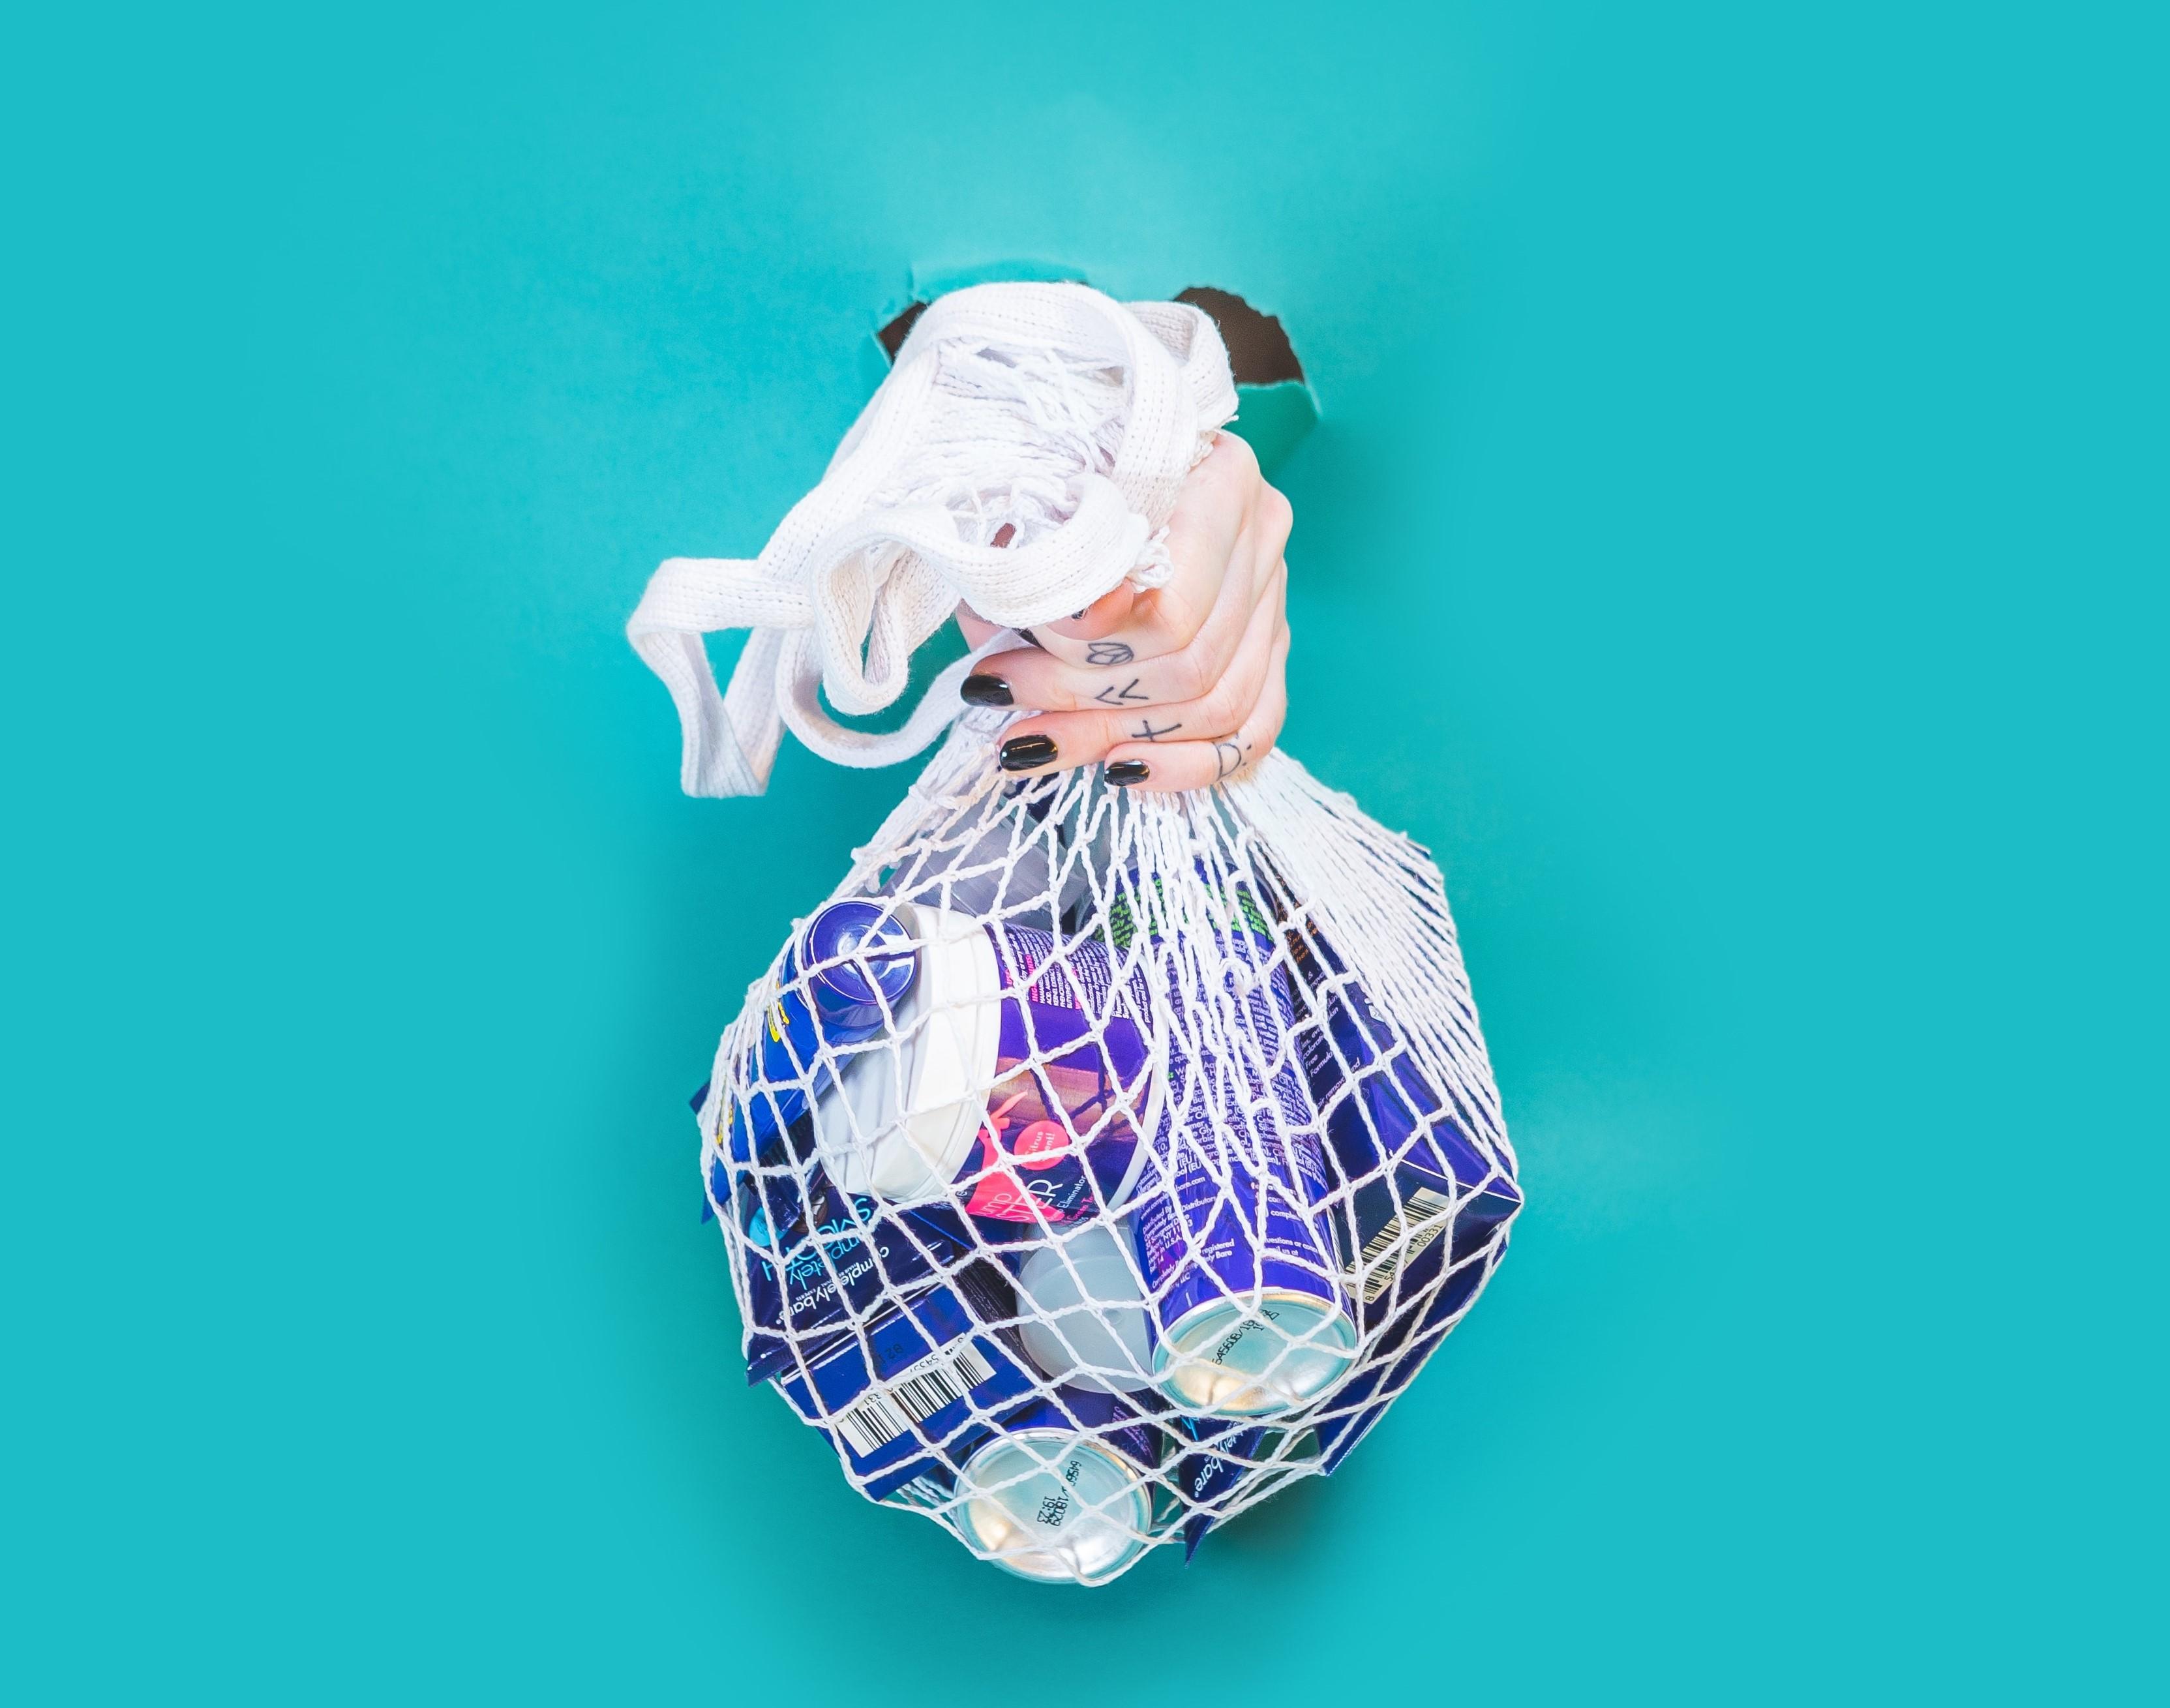 Plastik. Ograniczenie plastiku